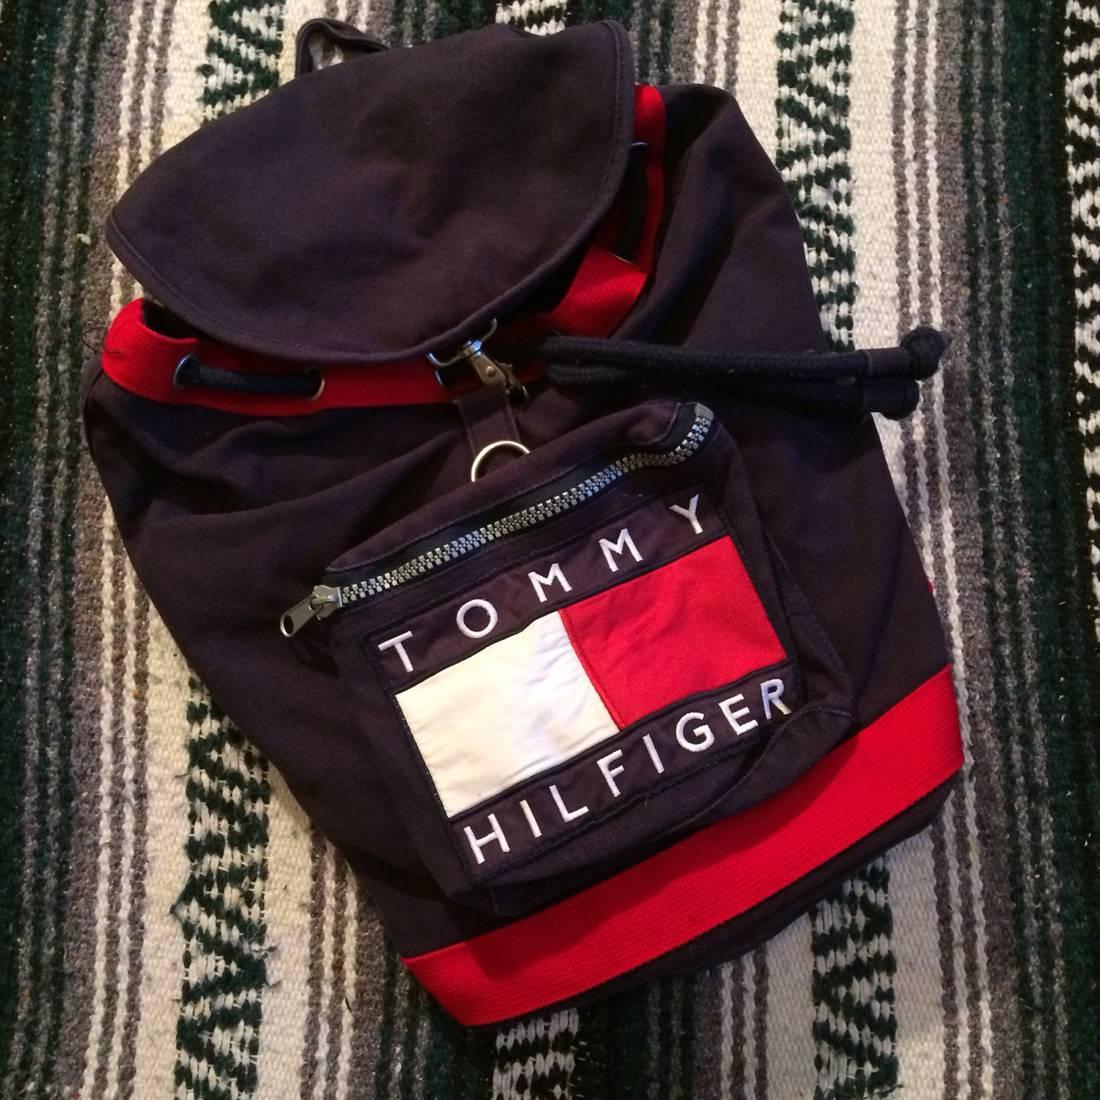 bbfec73d1e24 ... Vintage 90s Tommy Hilfiger Backpack watch 7abc0 491a4  LA Fitness Bags  - Gym Bag and cap ...